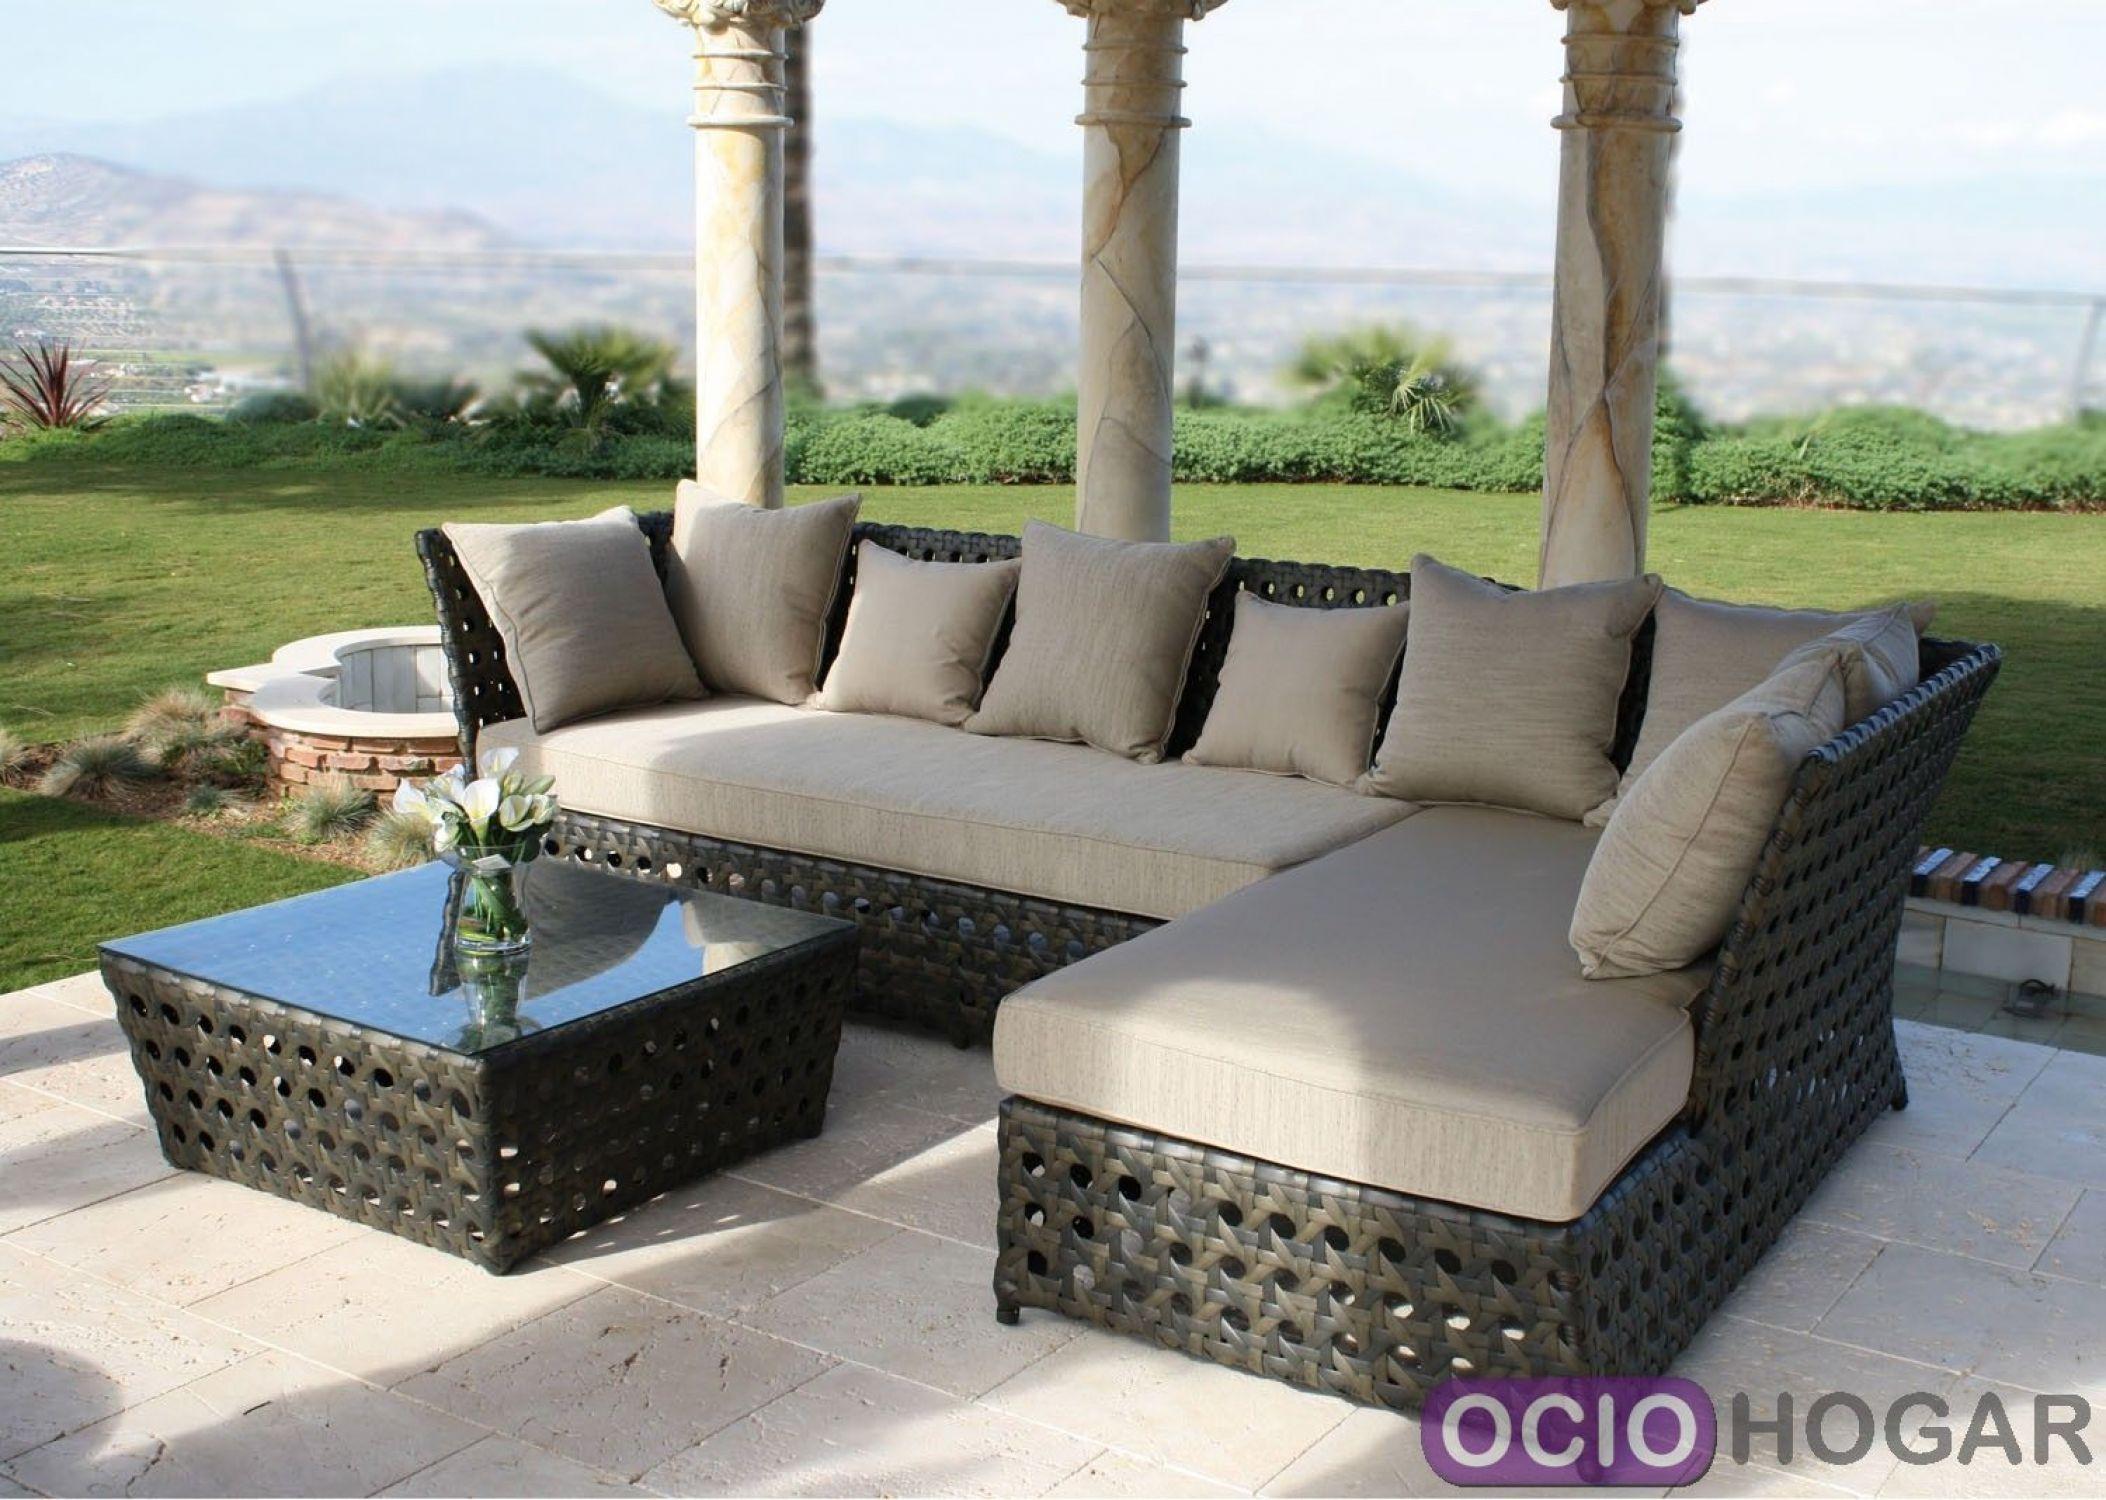 Conjunto sof s y mesa de centro tahit majestic garden for Sofa exterior aluminio blanco